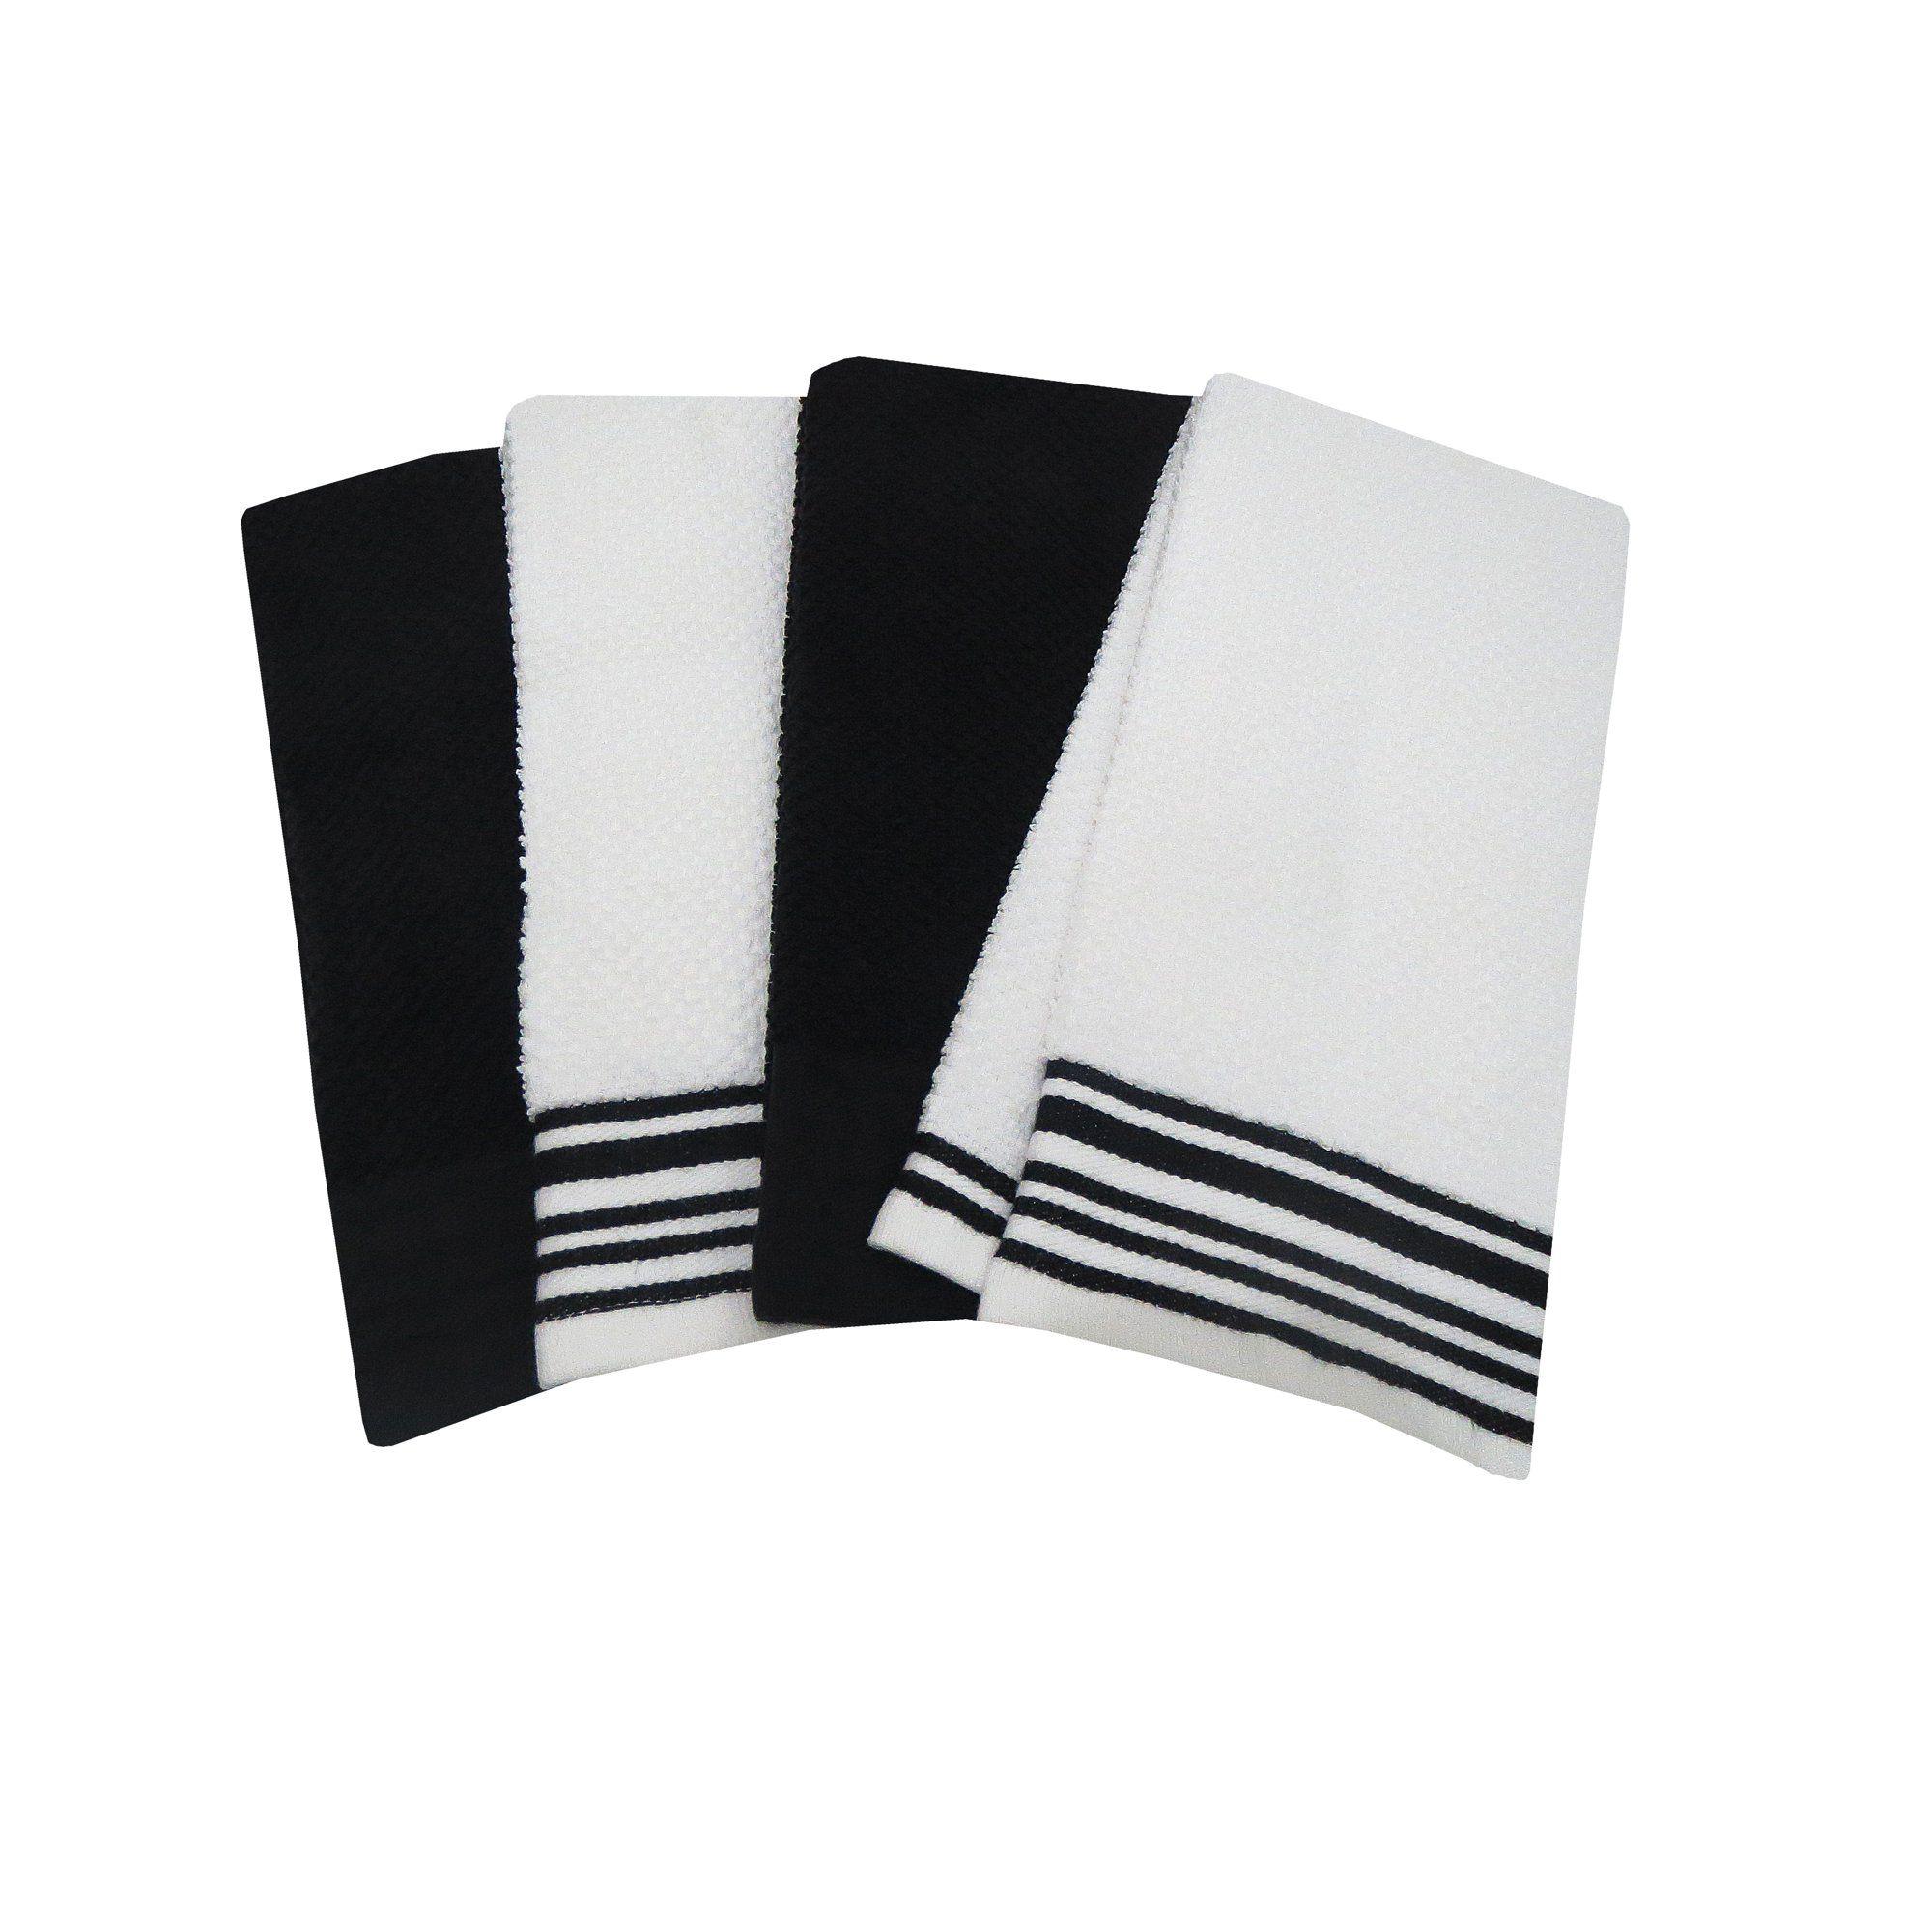 Mainstays 4 Pack Kitchen Towel Set Black Walmart Com In 2021 Towel Set Kitchen Towels White Kitchen Towels